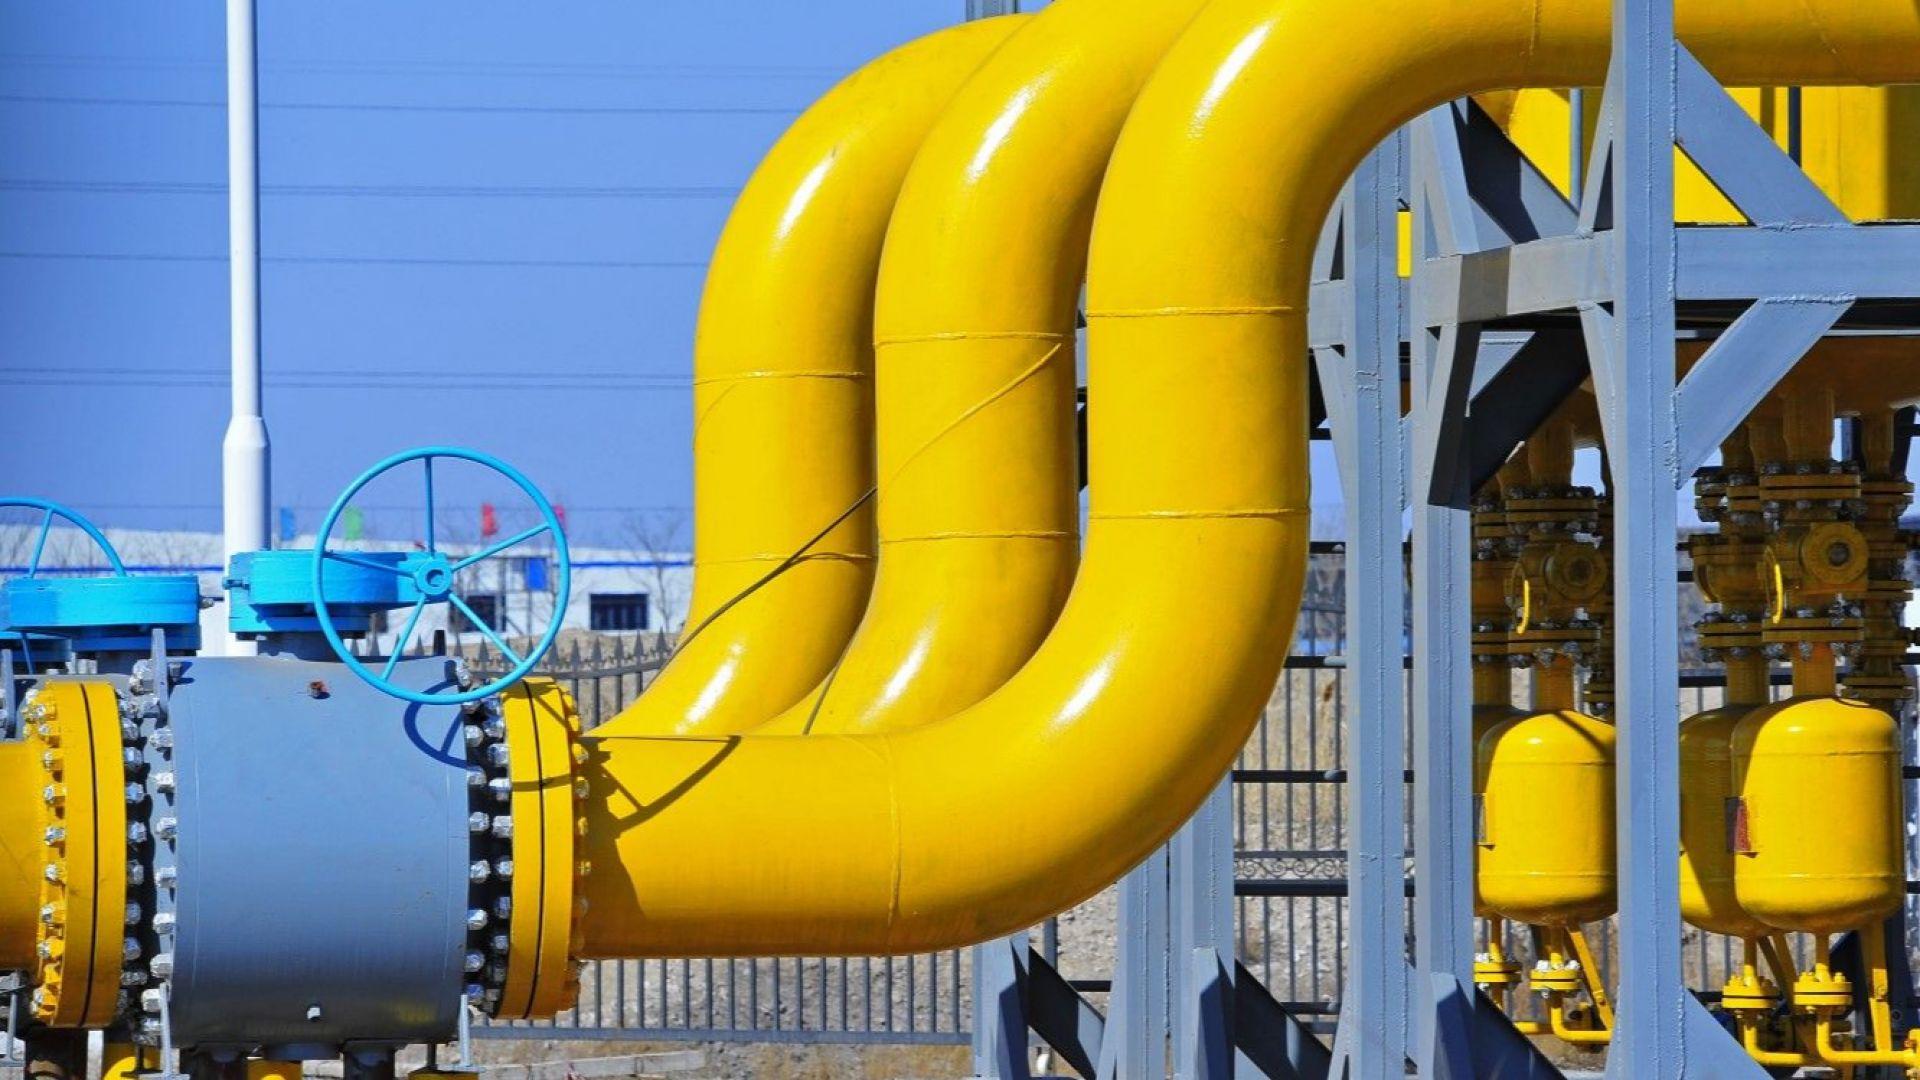 Украйна се договори с МВФ за ново стендбай споразумение